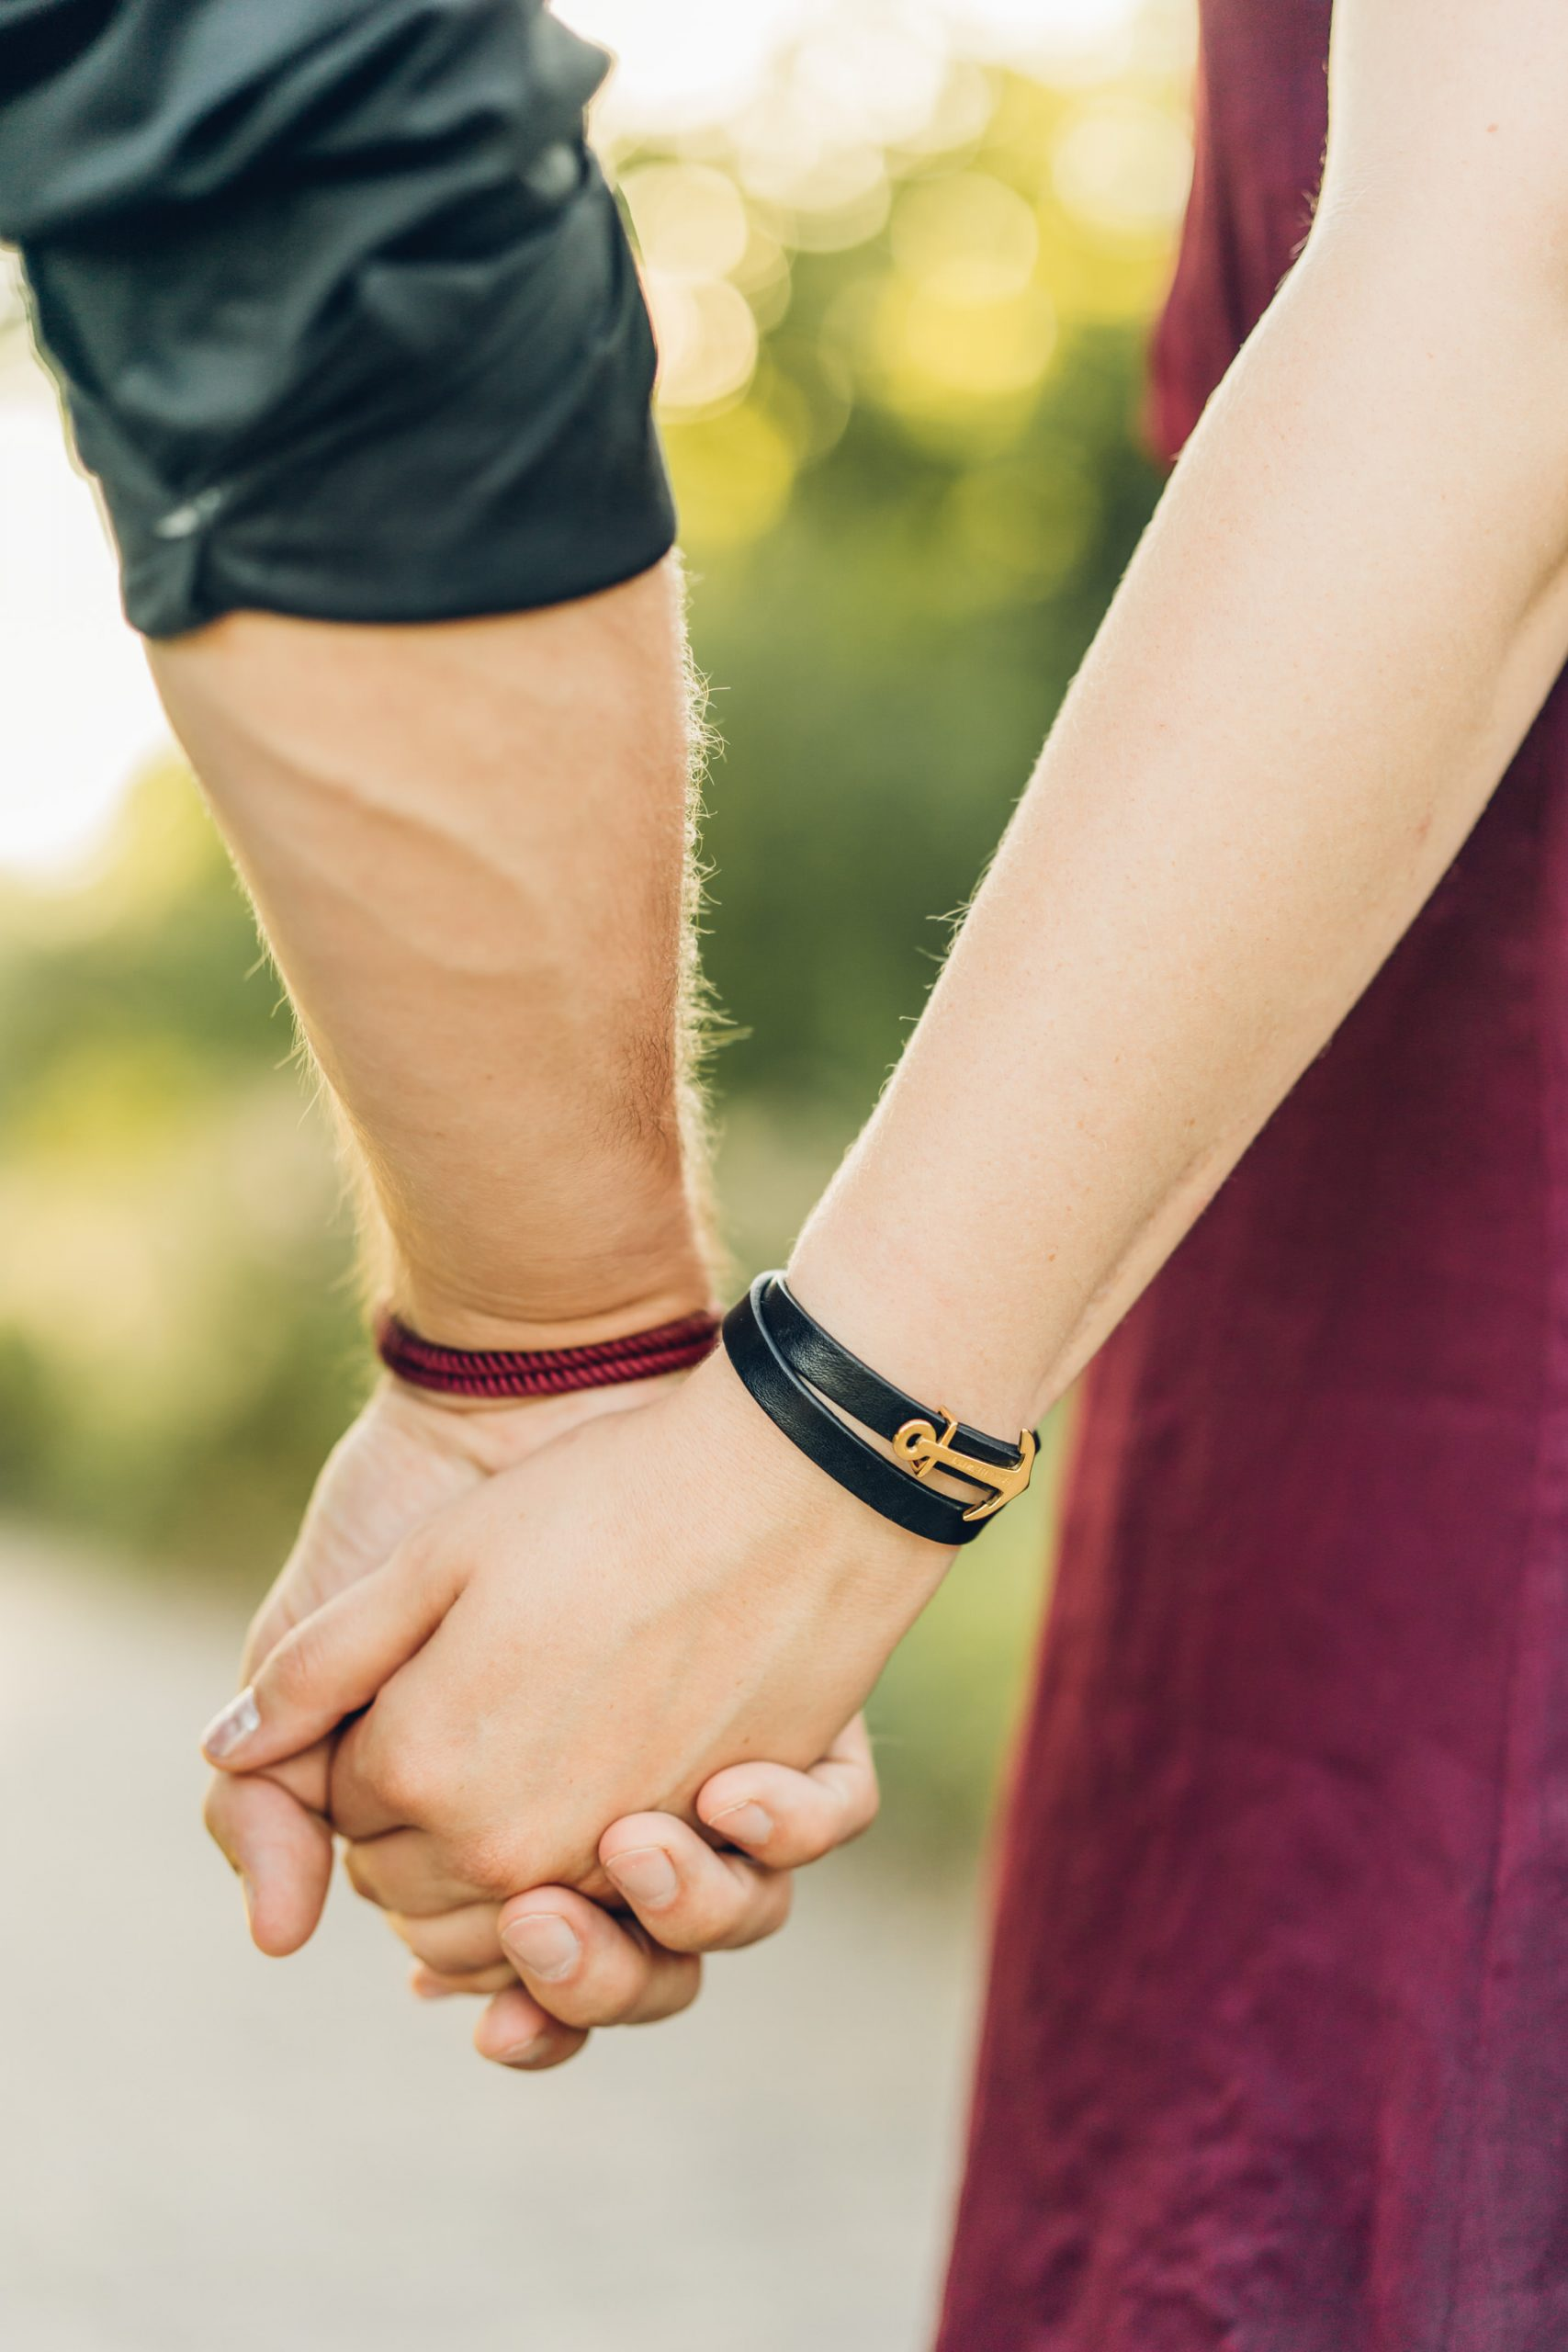 Pärchenshooting in der Natur Paar hält Händchen